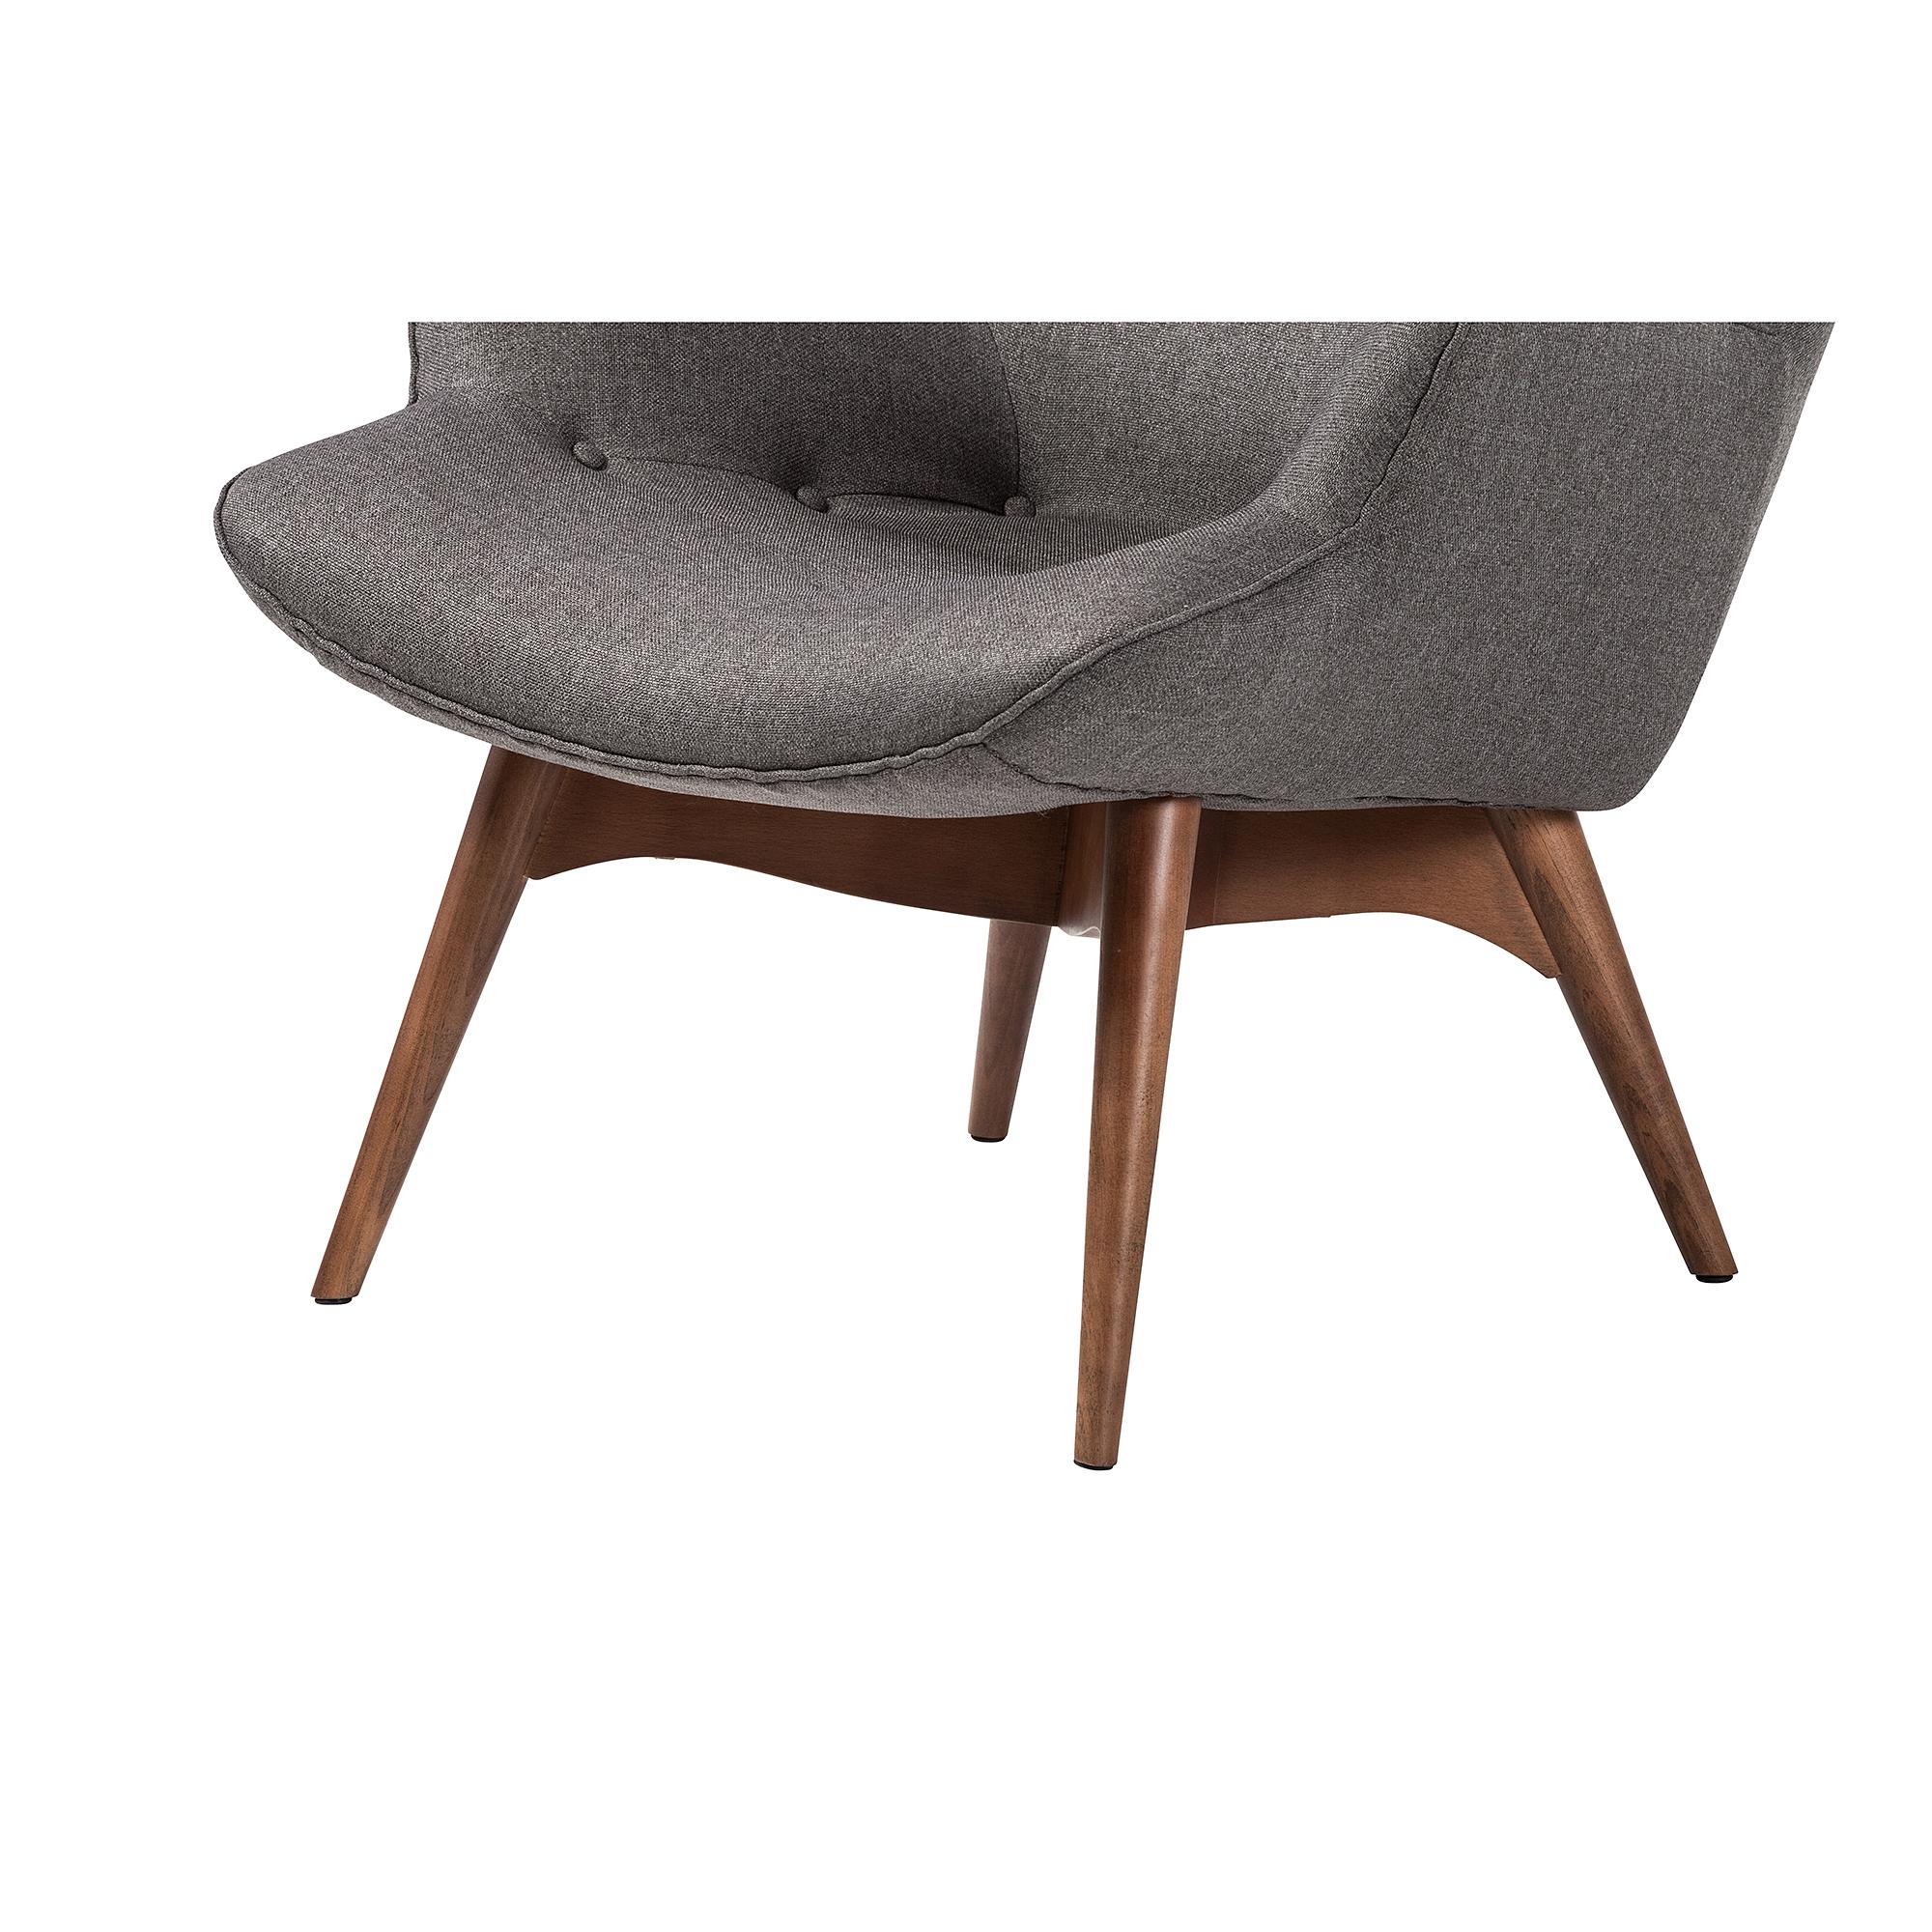 Surprising Featherston Style Contour Chair In Dark Grey Creativecarmelina Interior Chair Design Creativecarmelinacom